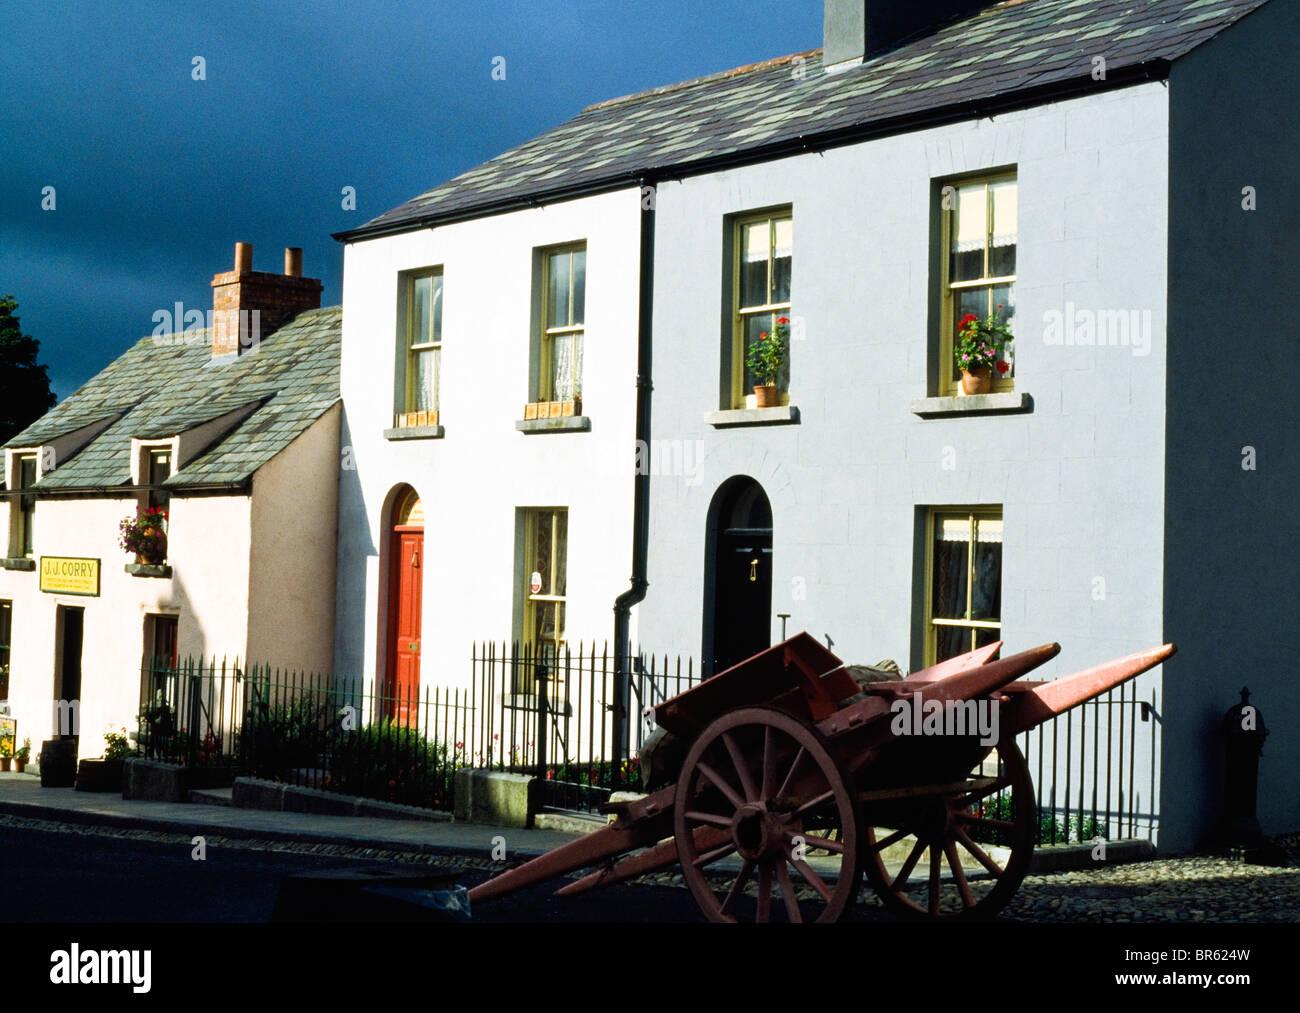 Bunratty, Co Clare, Ireland, Bunratty Folk Park - Stock Image